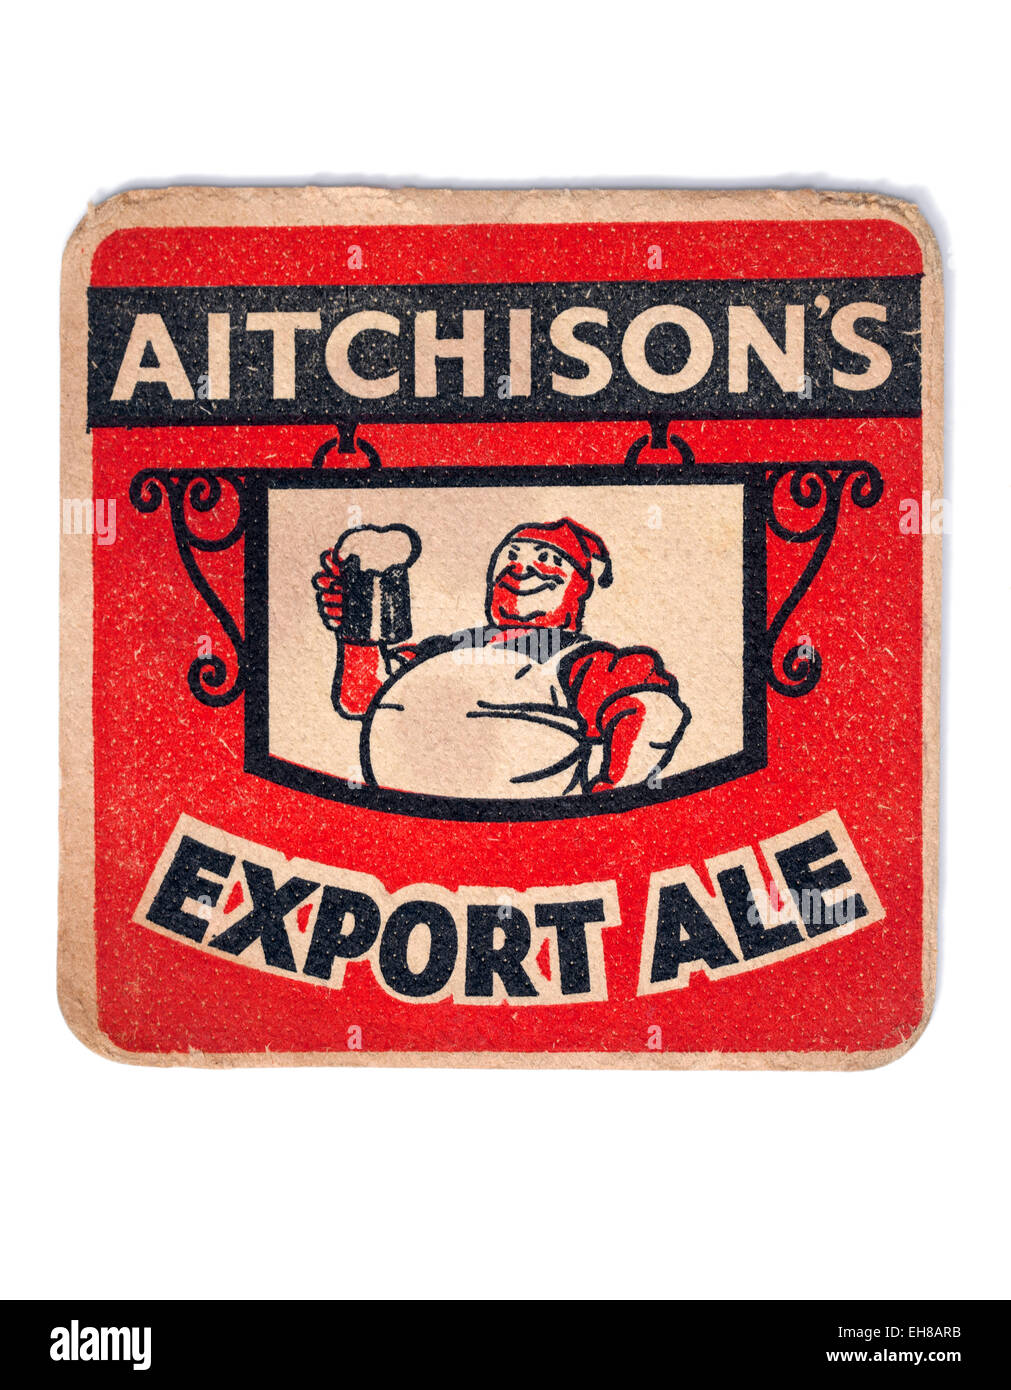 Vintage Beermat Advertising Aitchisons Export Ale Beer - Stock Image